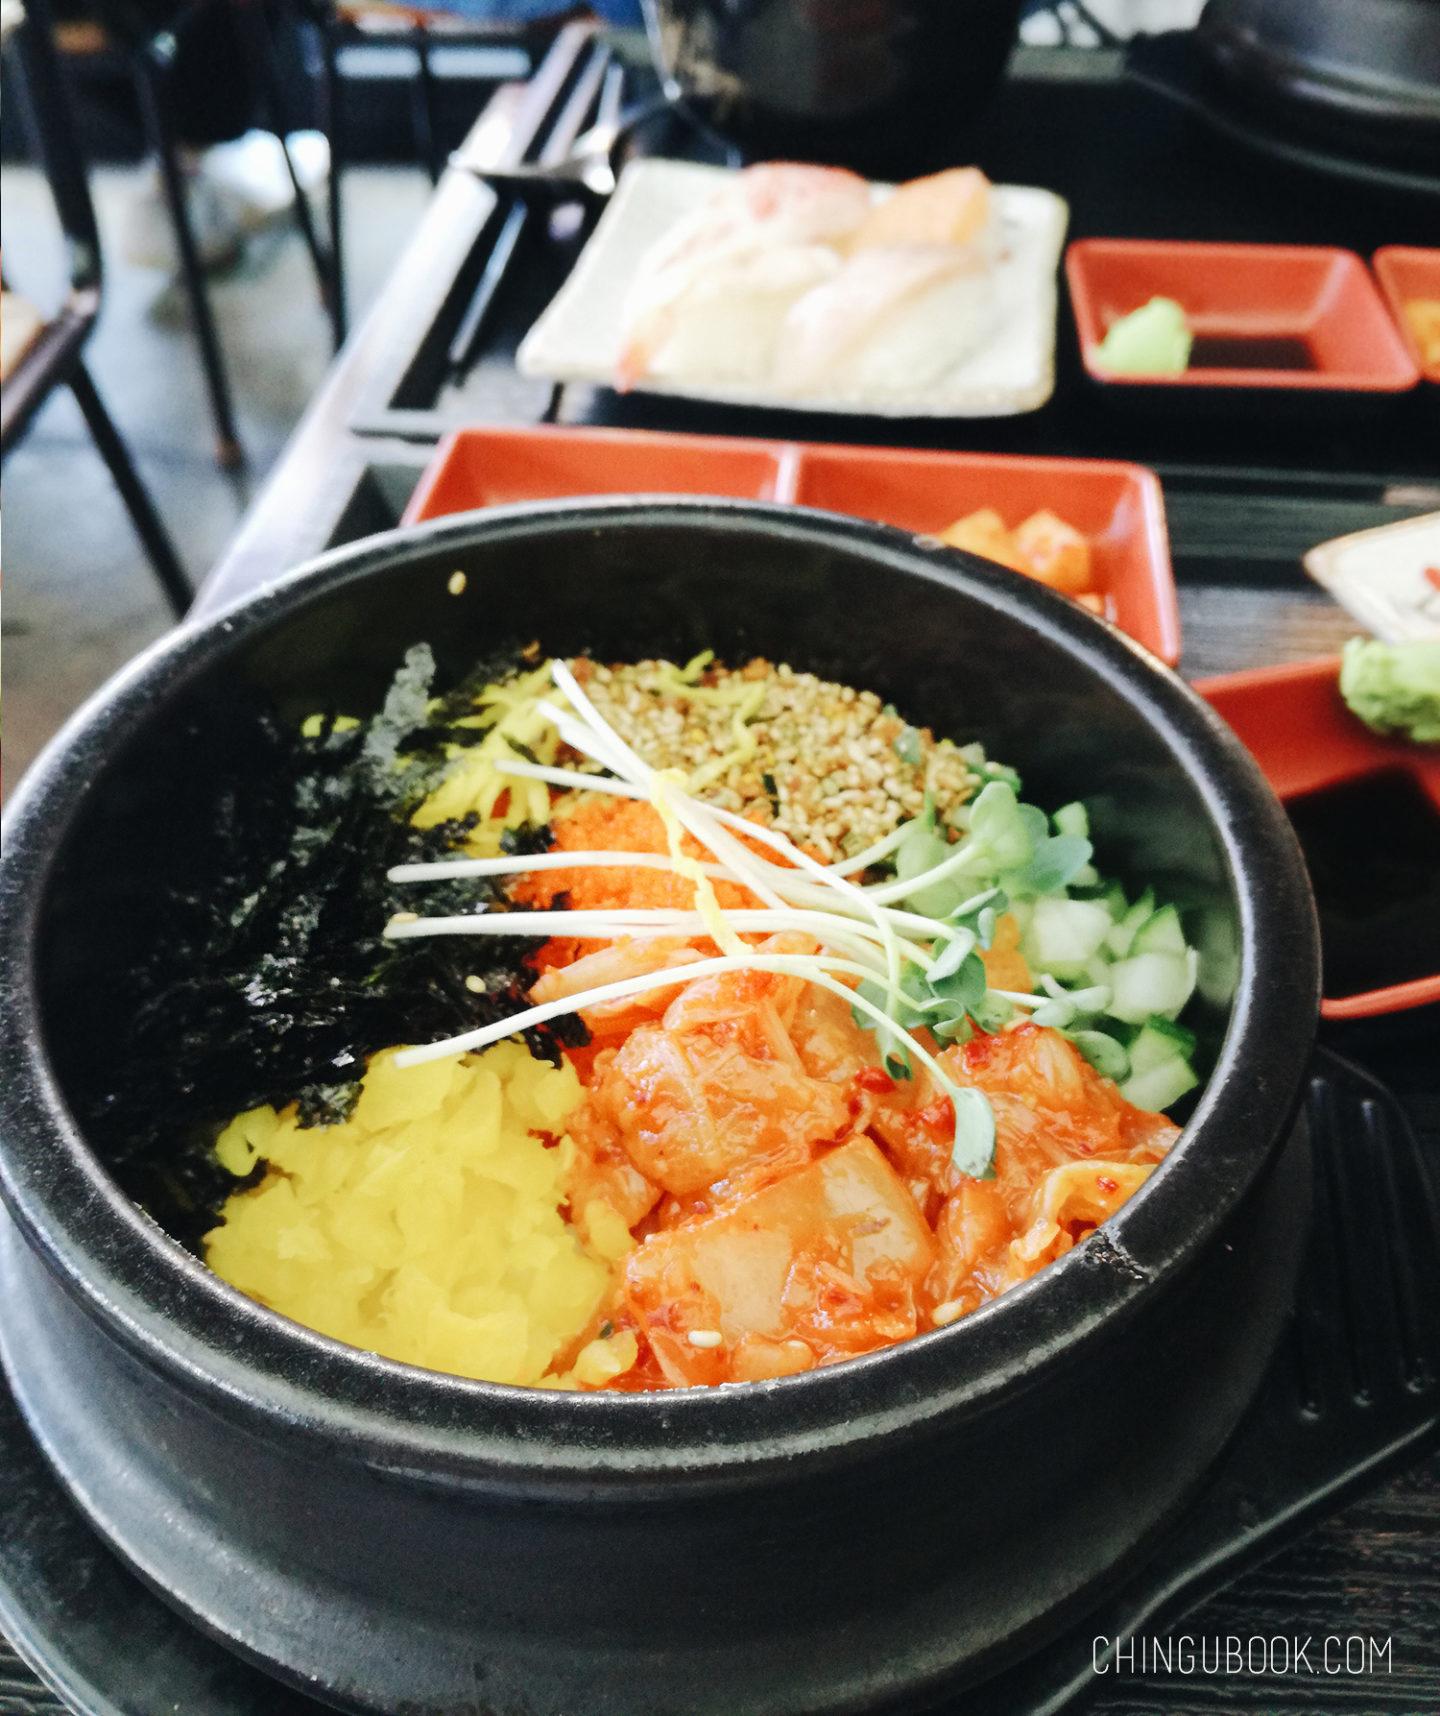 gastronomie coréenne - bibimbap